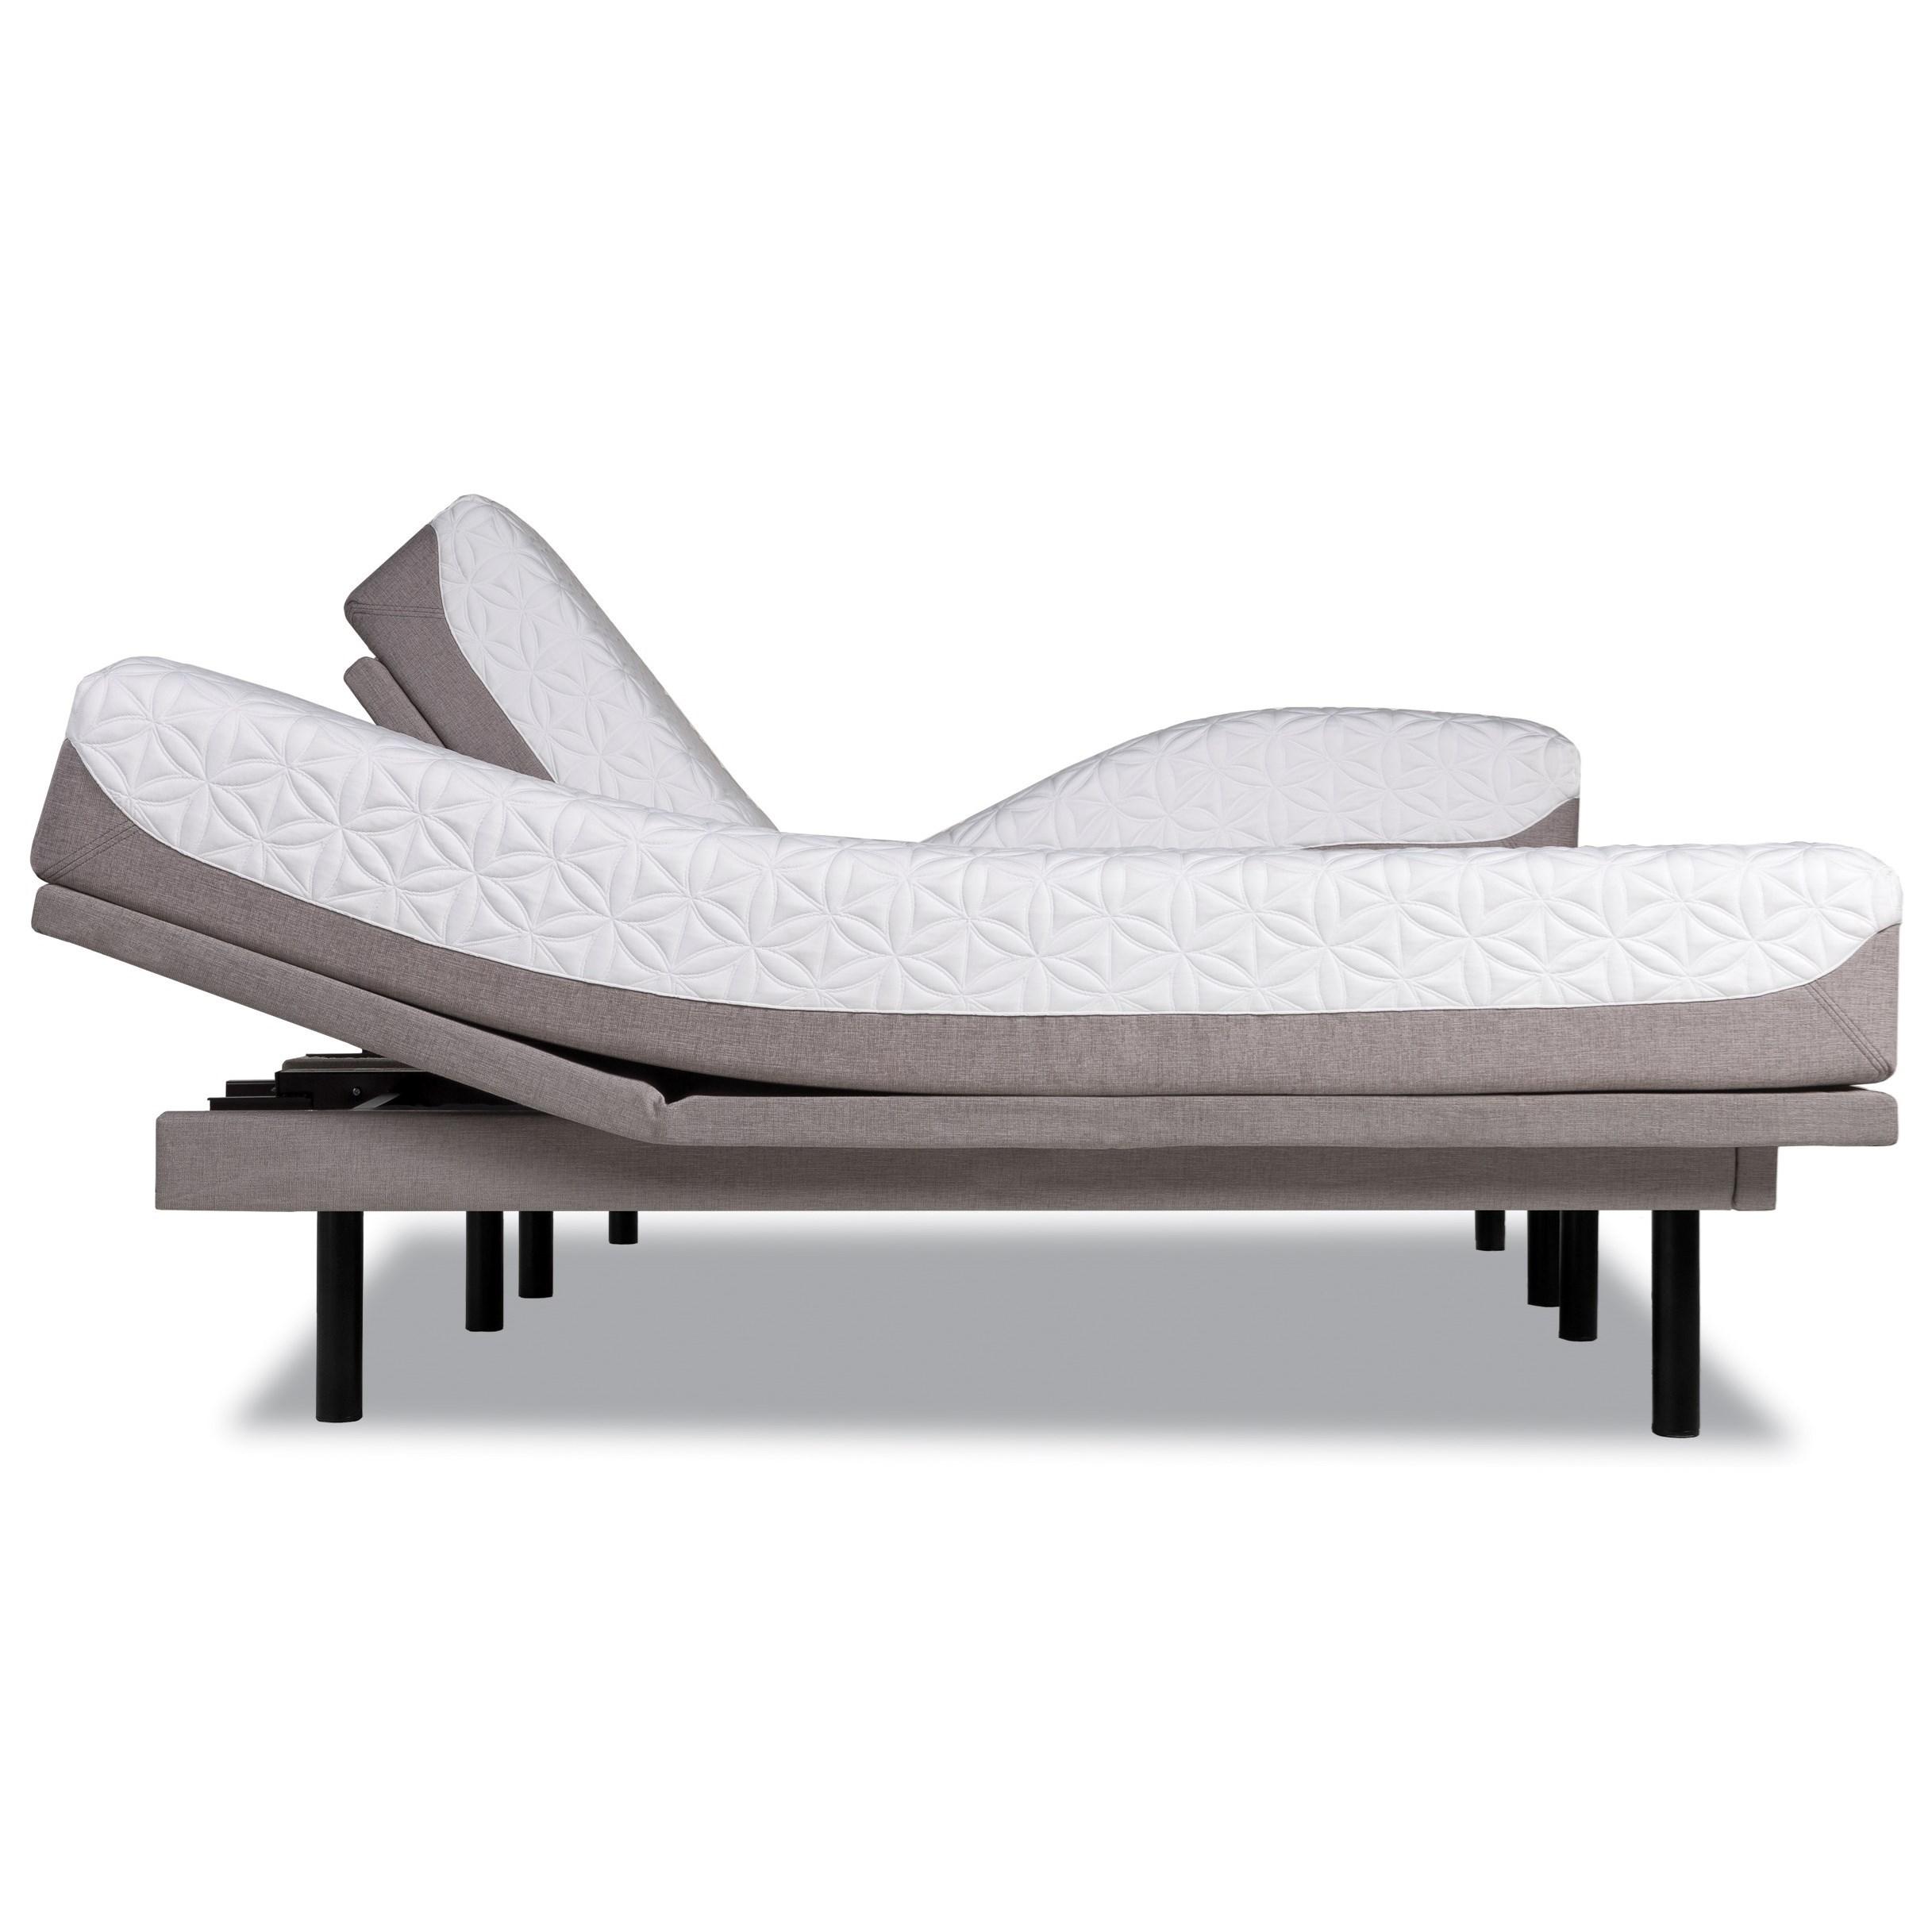 Tempur-Pedic® TEMPUR-Cloud Prima Full Medium-Soft Mattress Set - Item Number: 10237130+25289230